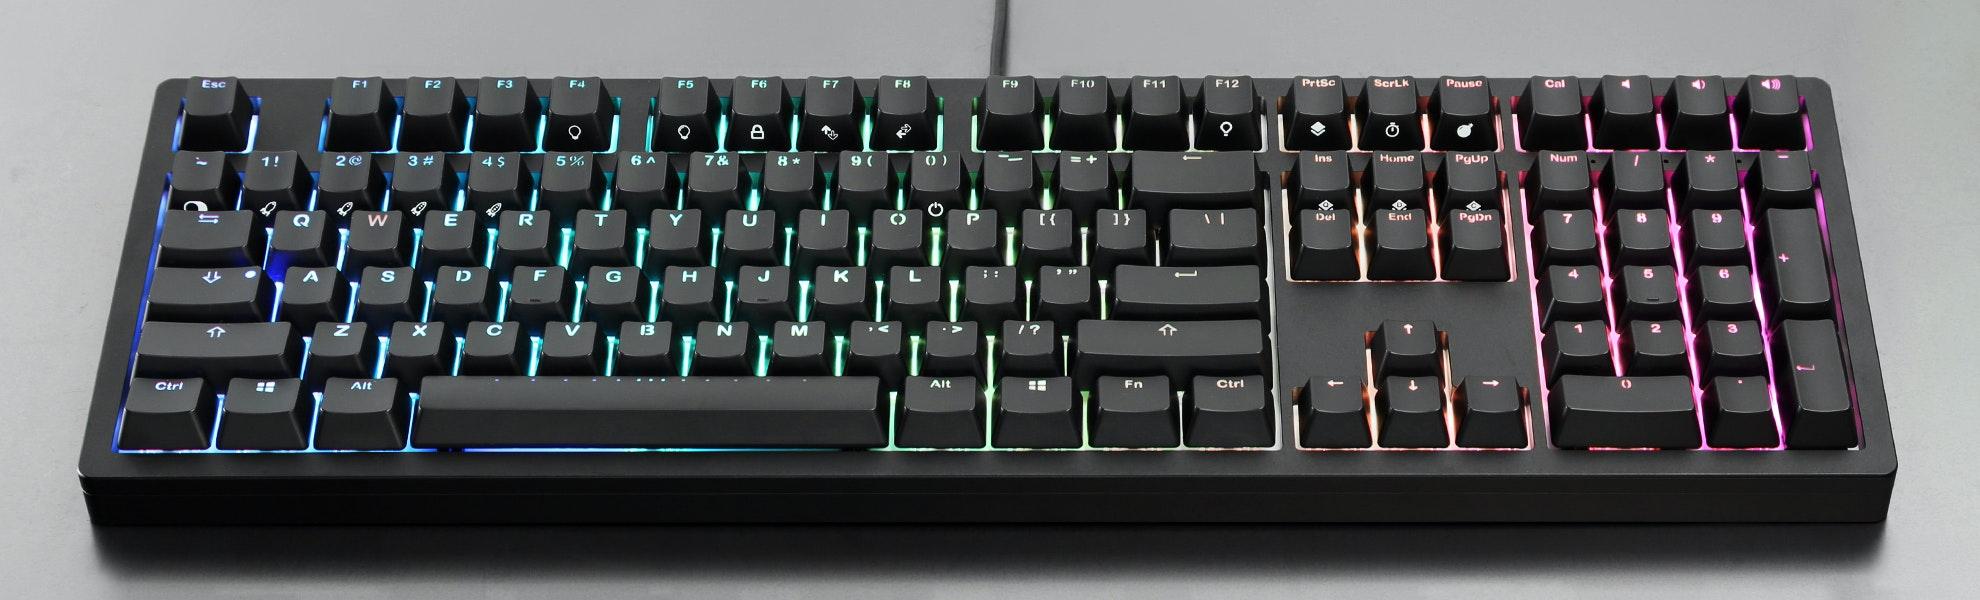 IKBC Fullsize CNC Aluminum RGB Mechanical Keyboard